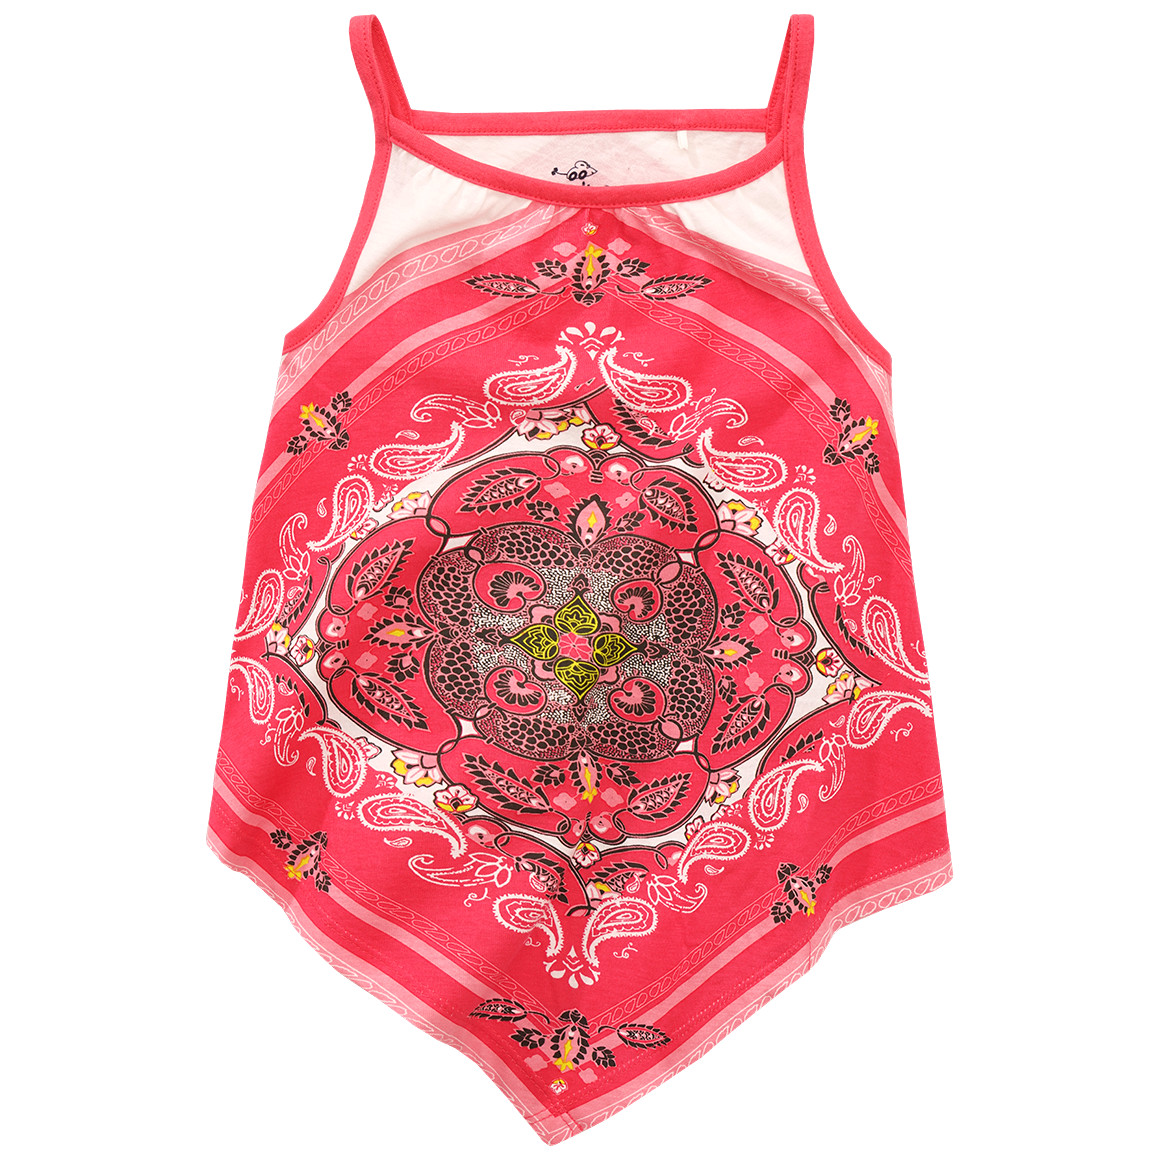 Mädchen Top mit Mandala Print